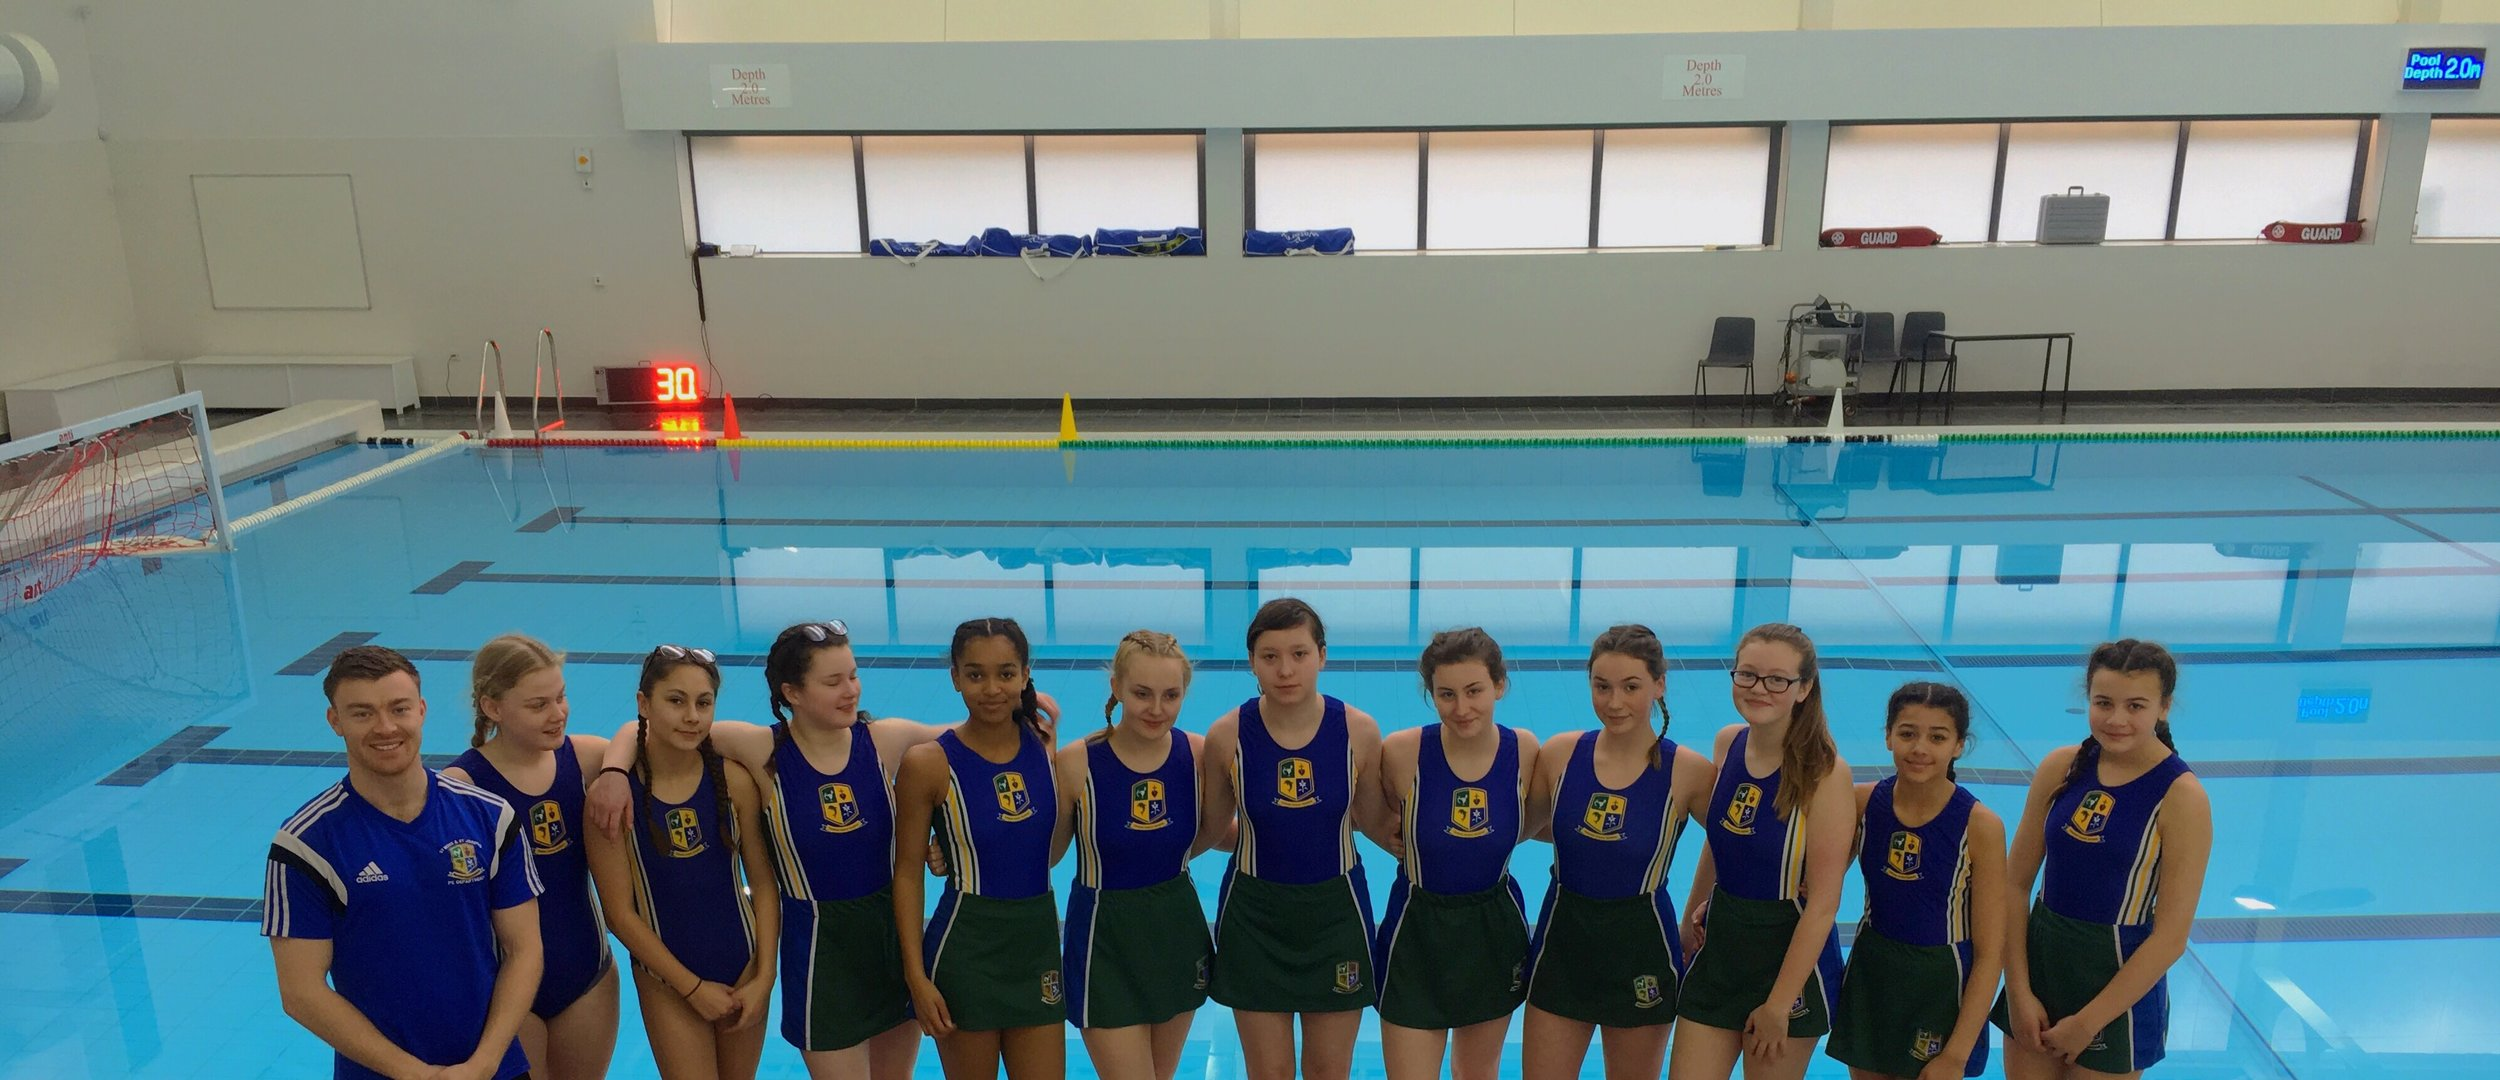 U15 Girls ESSA Final Poolside.JPG